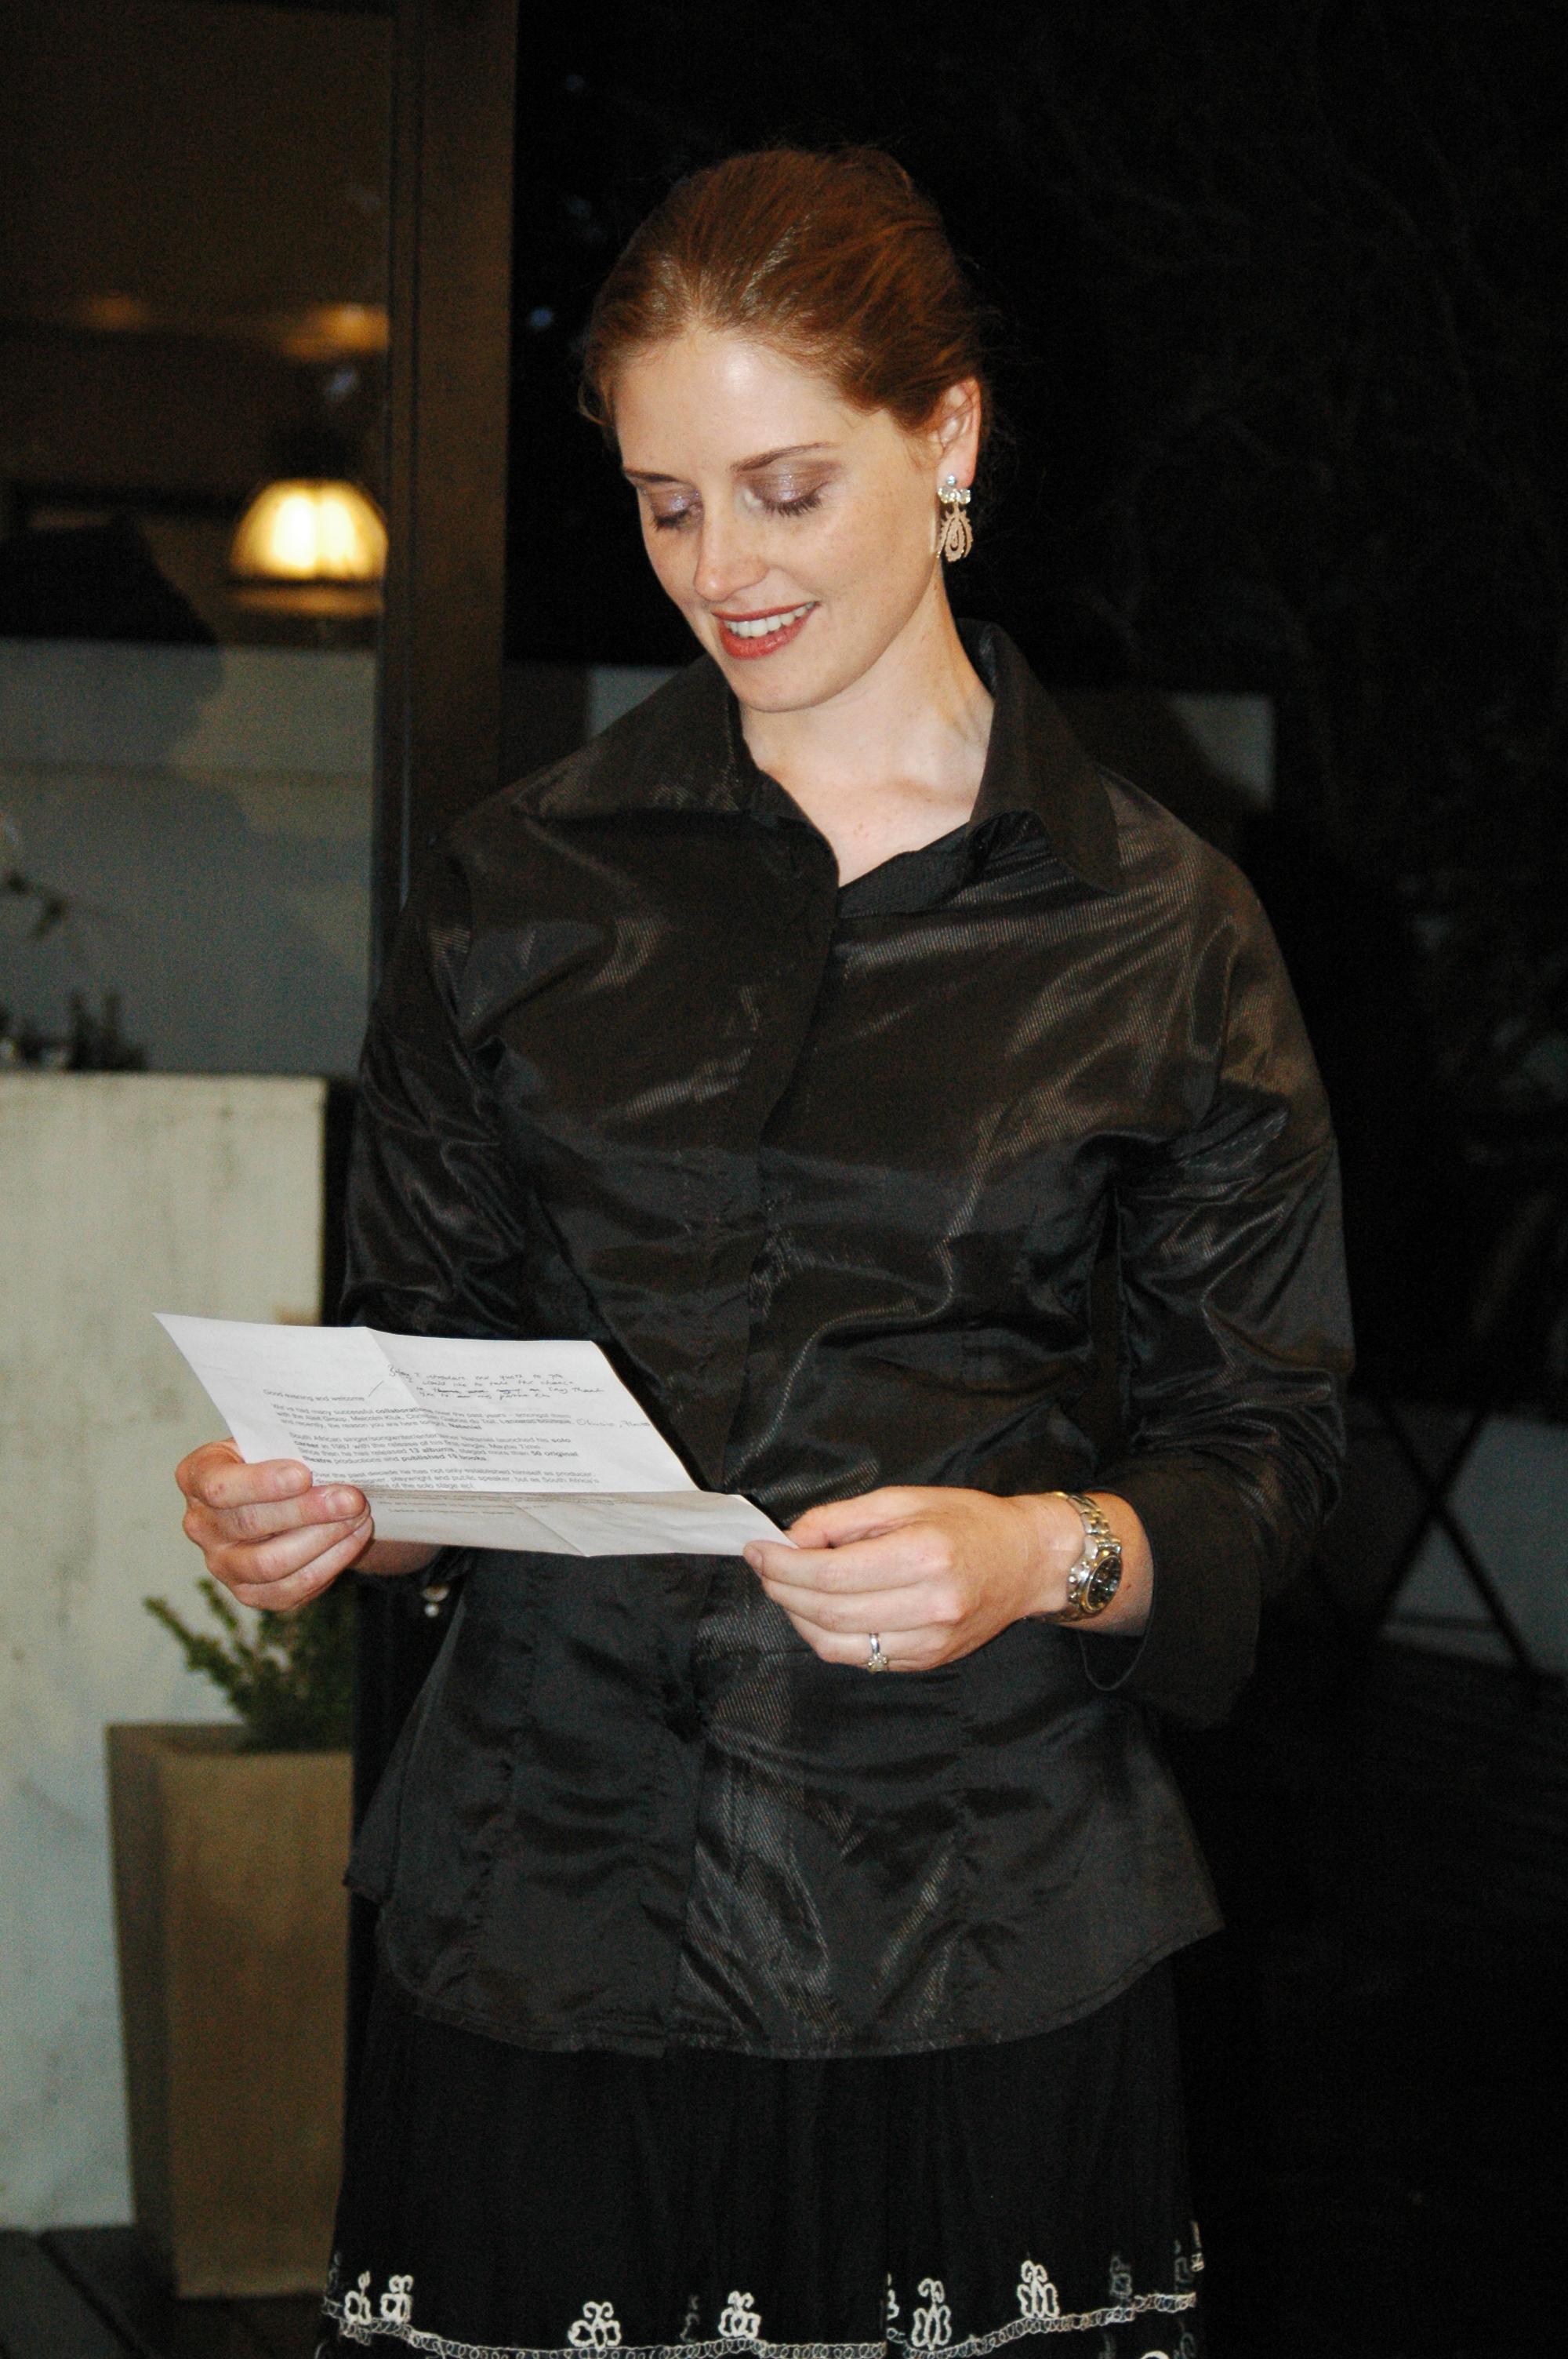 LAUNCH OF THE NATANIEL RANGE AT BOEZAART BAUERMEISTER DEC 2006